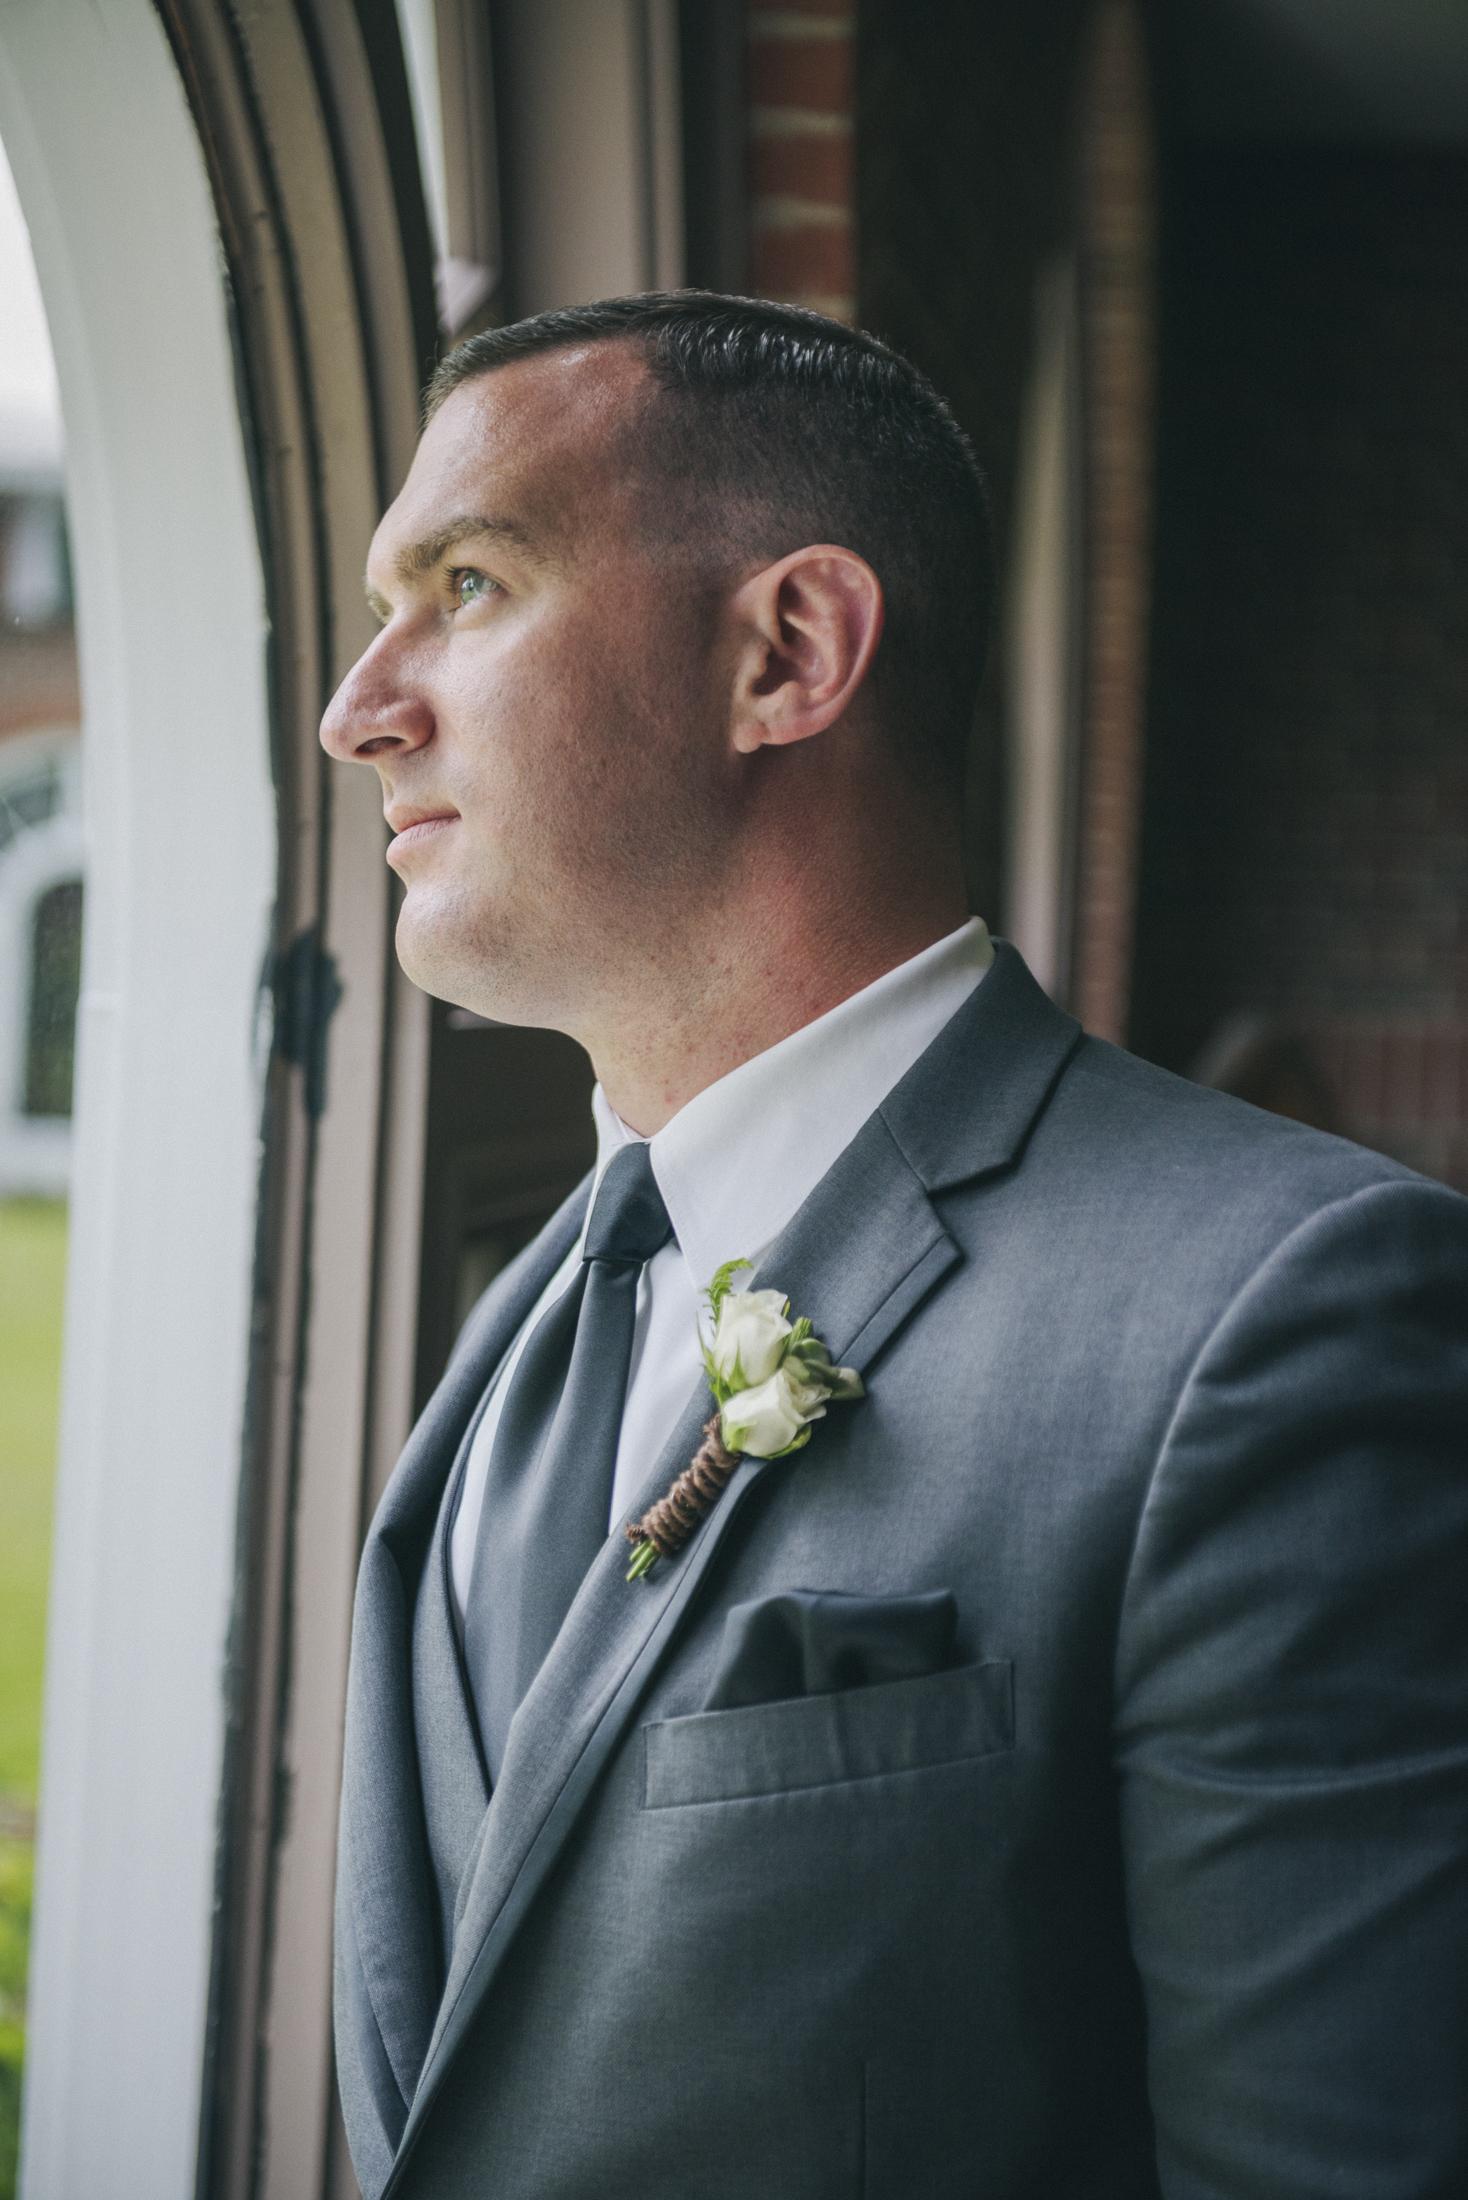 NH Wedding Photographer: Saint Anselm College groom